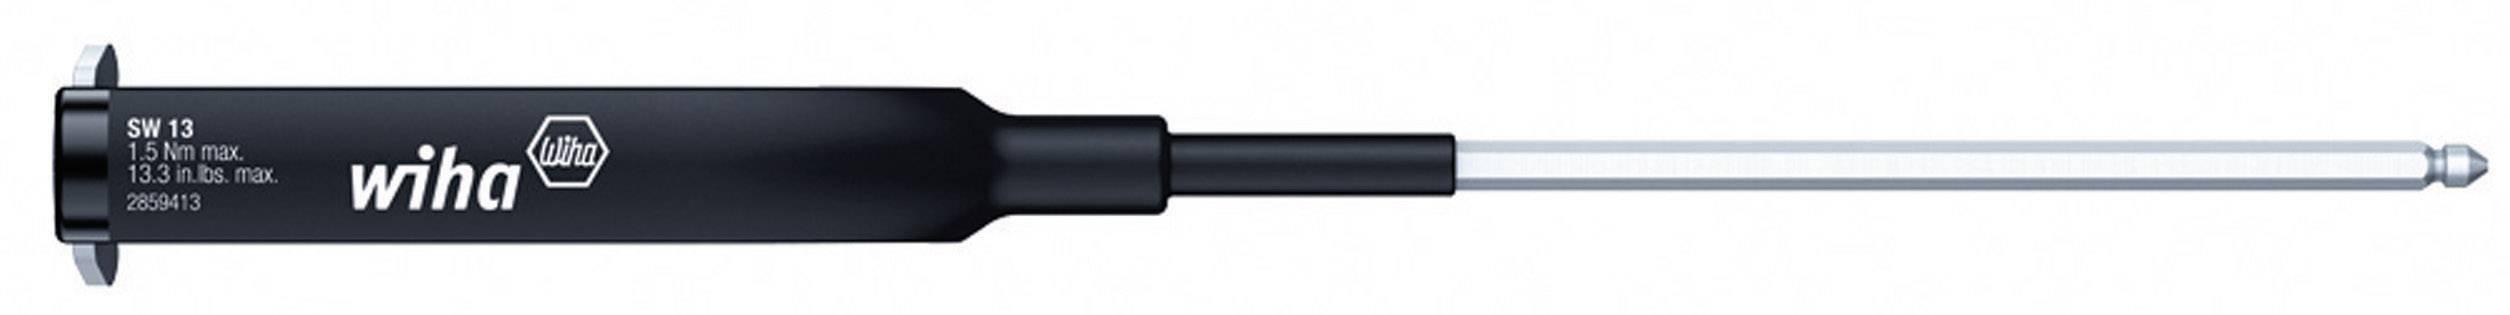 Bit momentového kľúča Wiha Torque 2859 36415, 218 mm